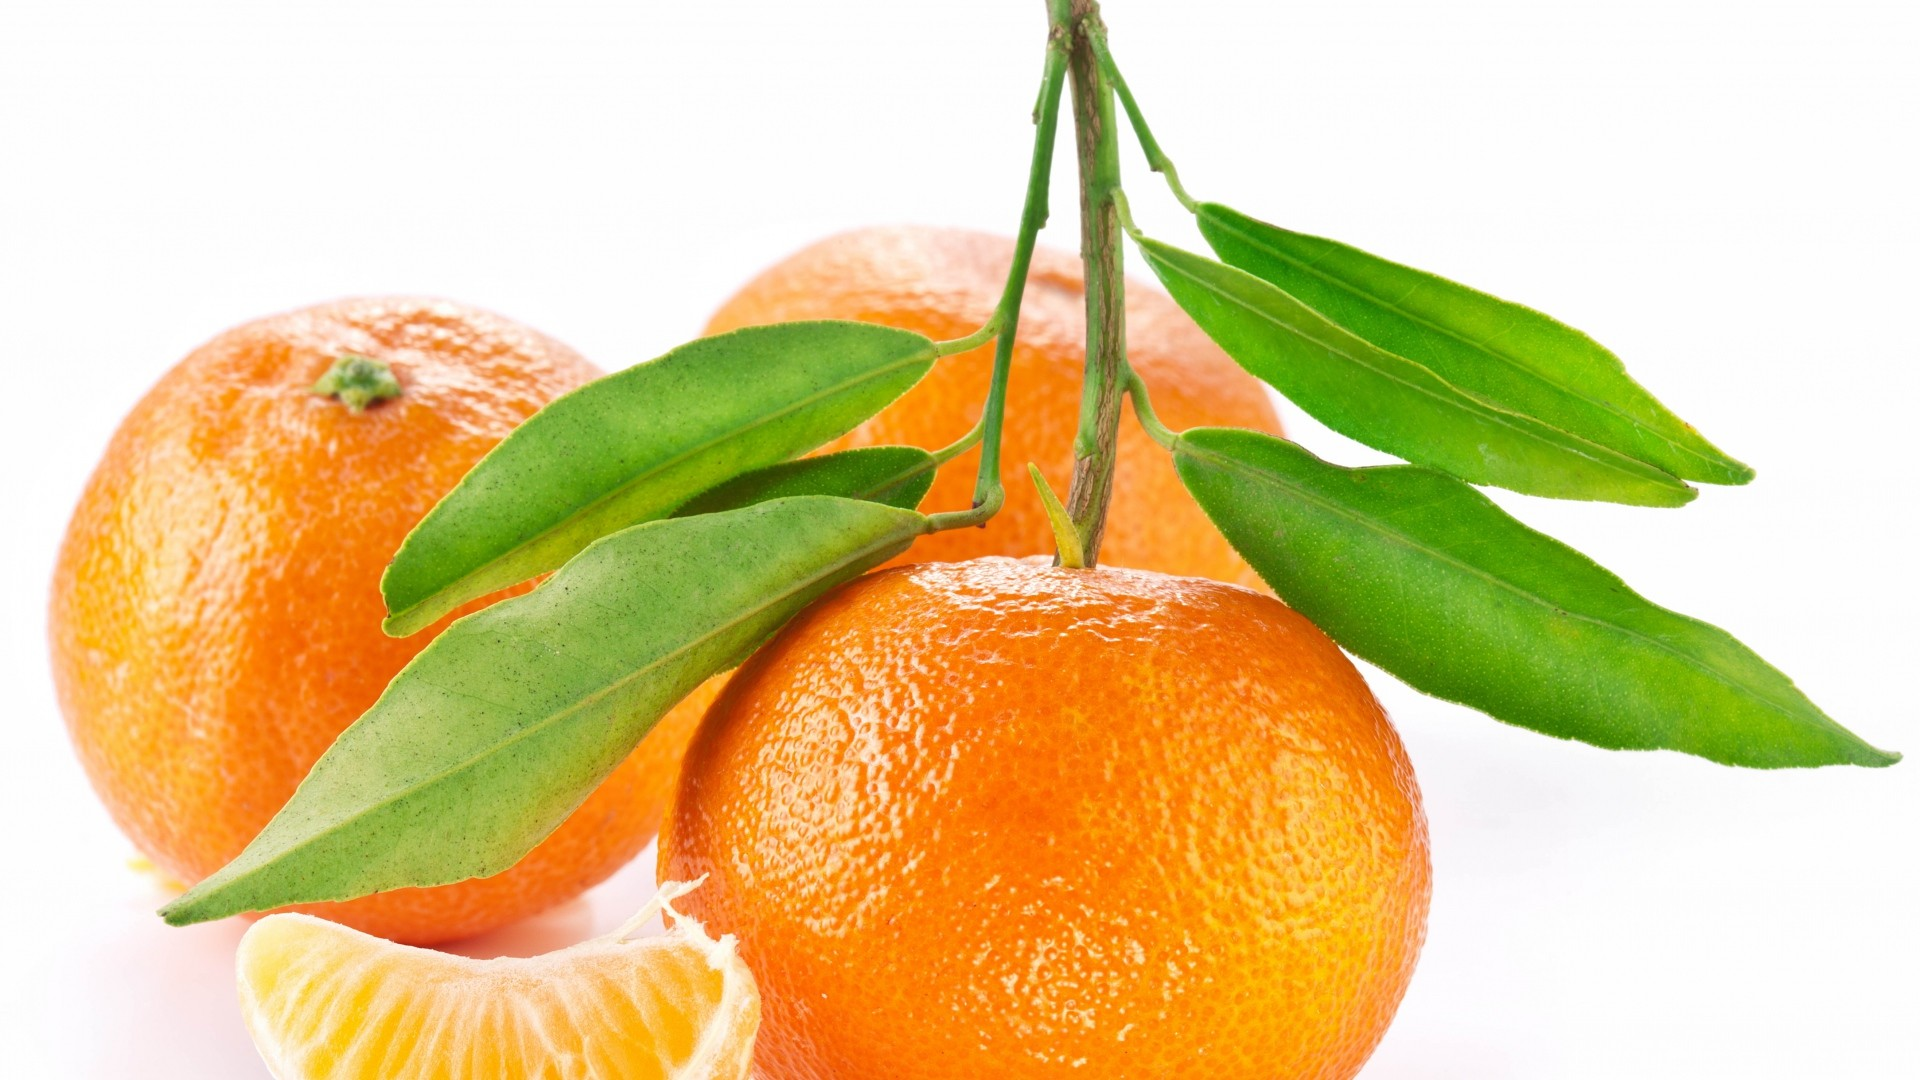 Preview wallpaper orange, fruit, white background, leaf 1920×1080